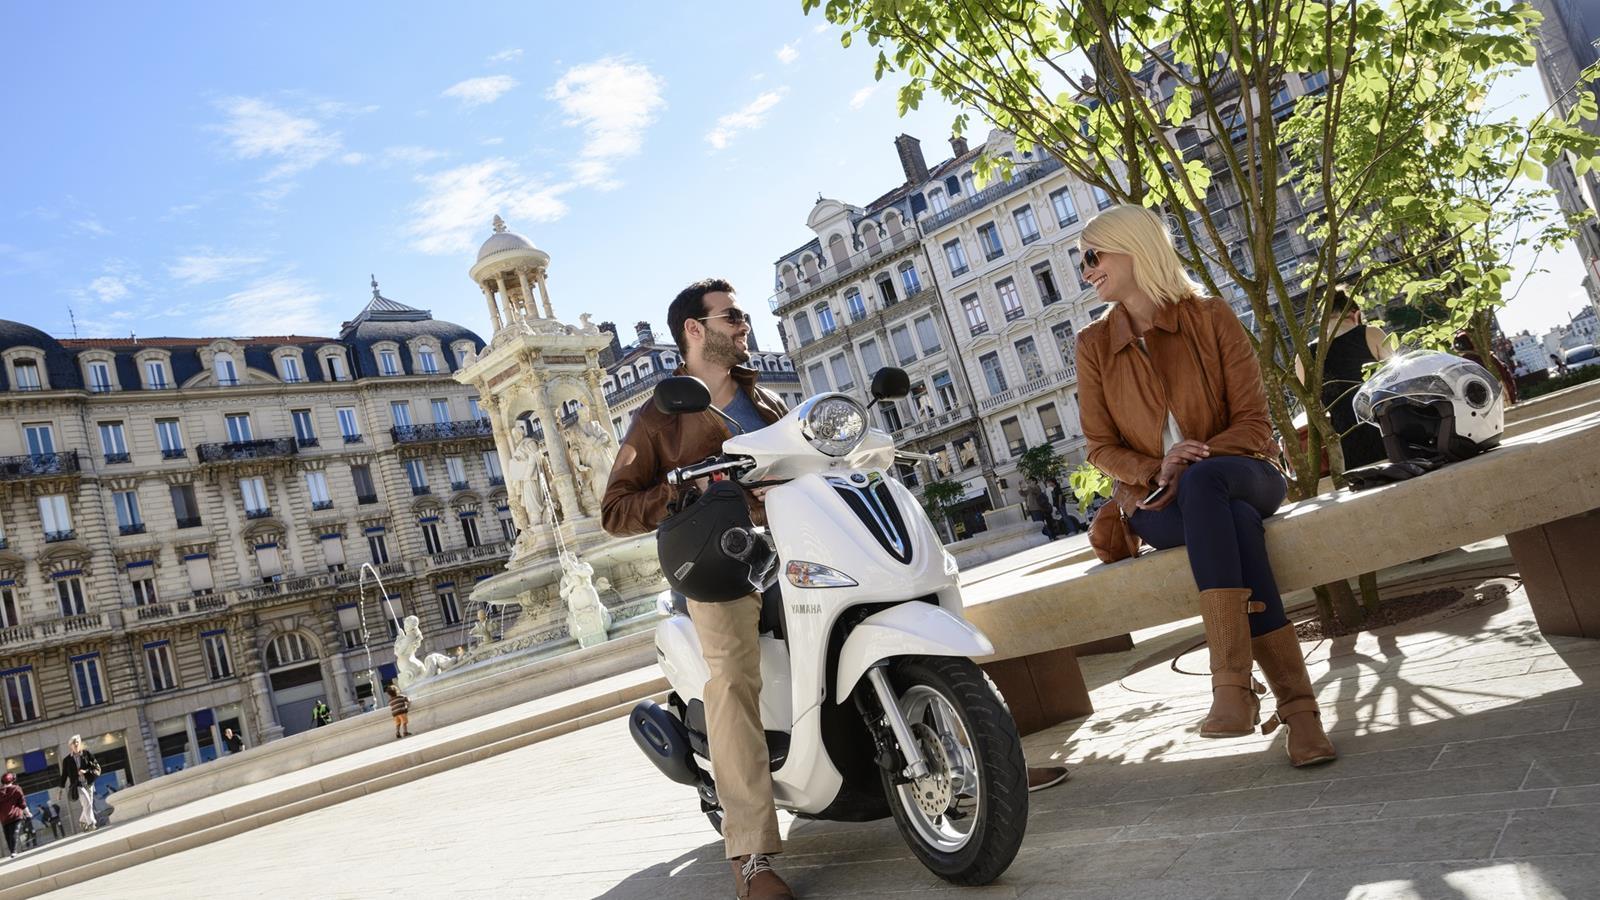 http://www.motorrad-bilder.at/slideshows/291/009842/yamaha-delight-16.jpg